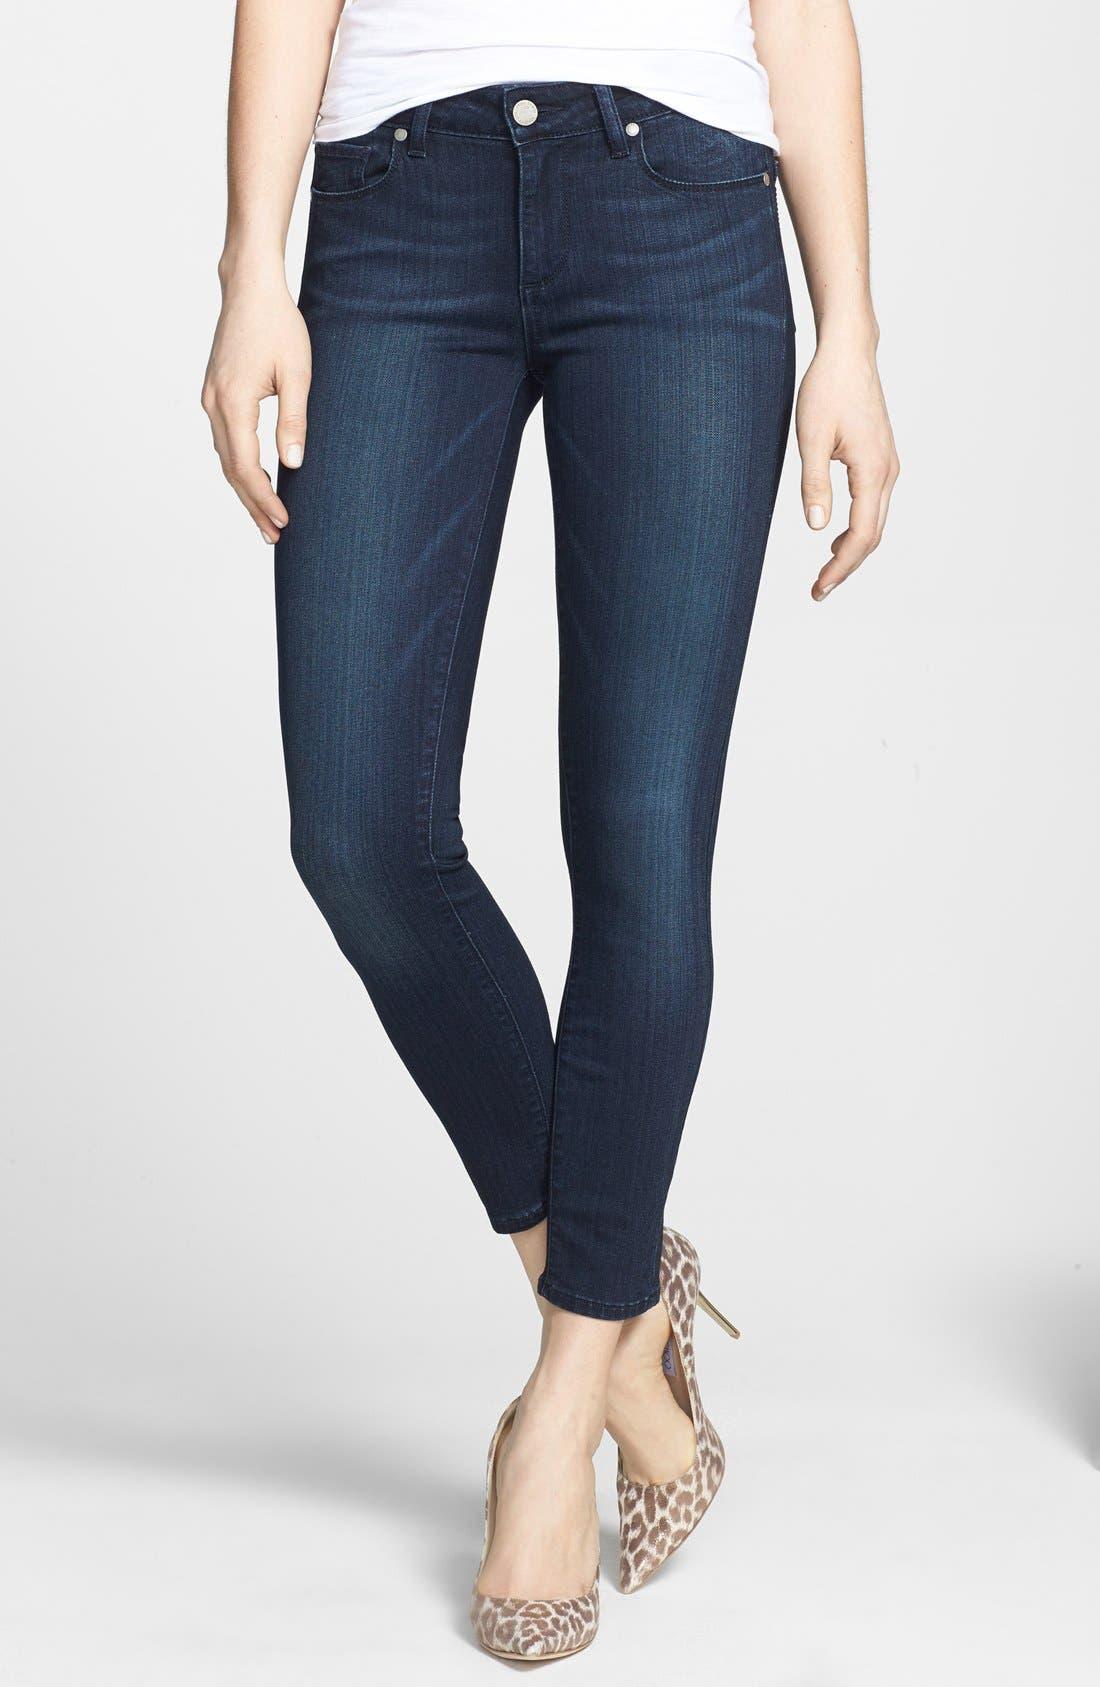 PAIGE Transcend - Verdugo Crop Skinny Jeans (Midlake)